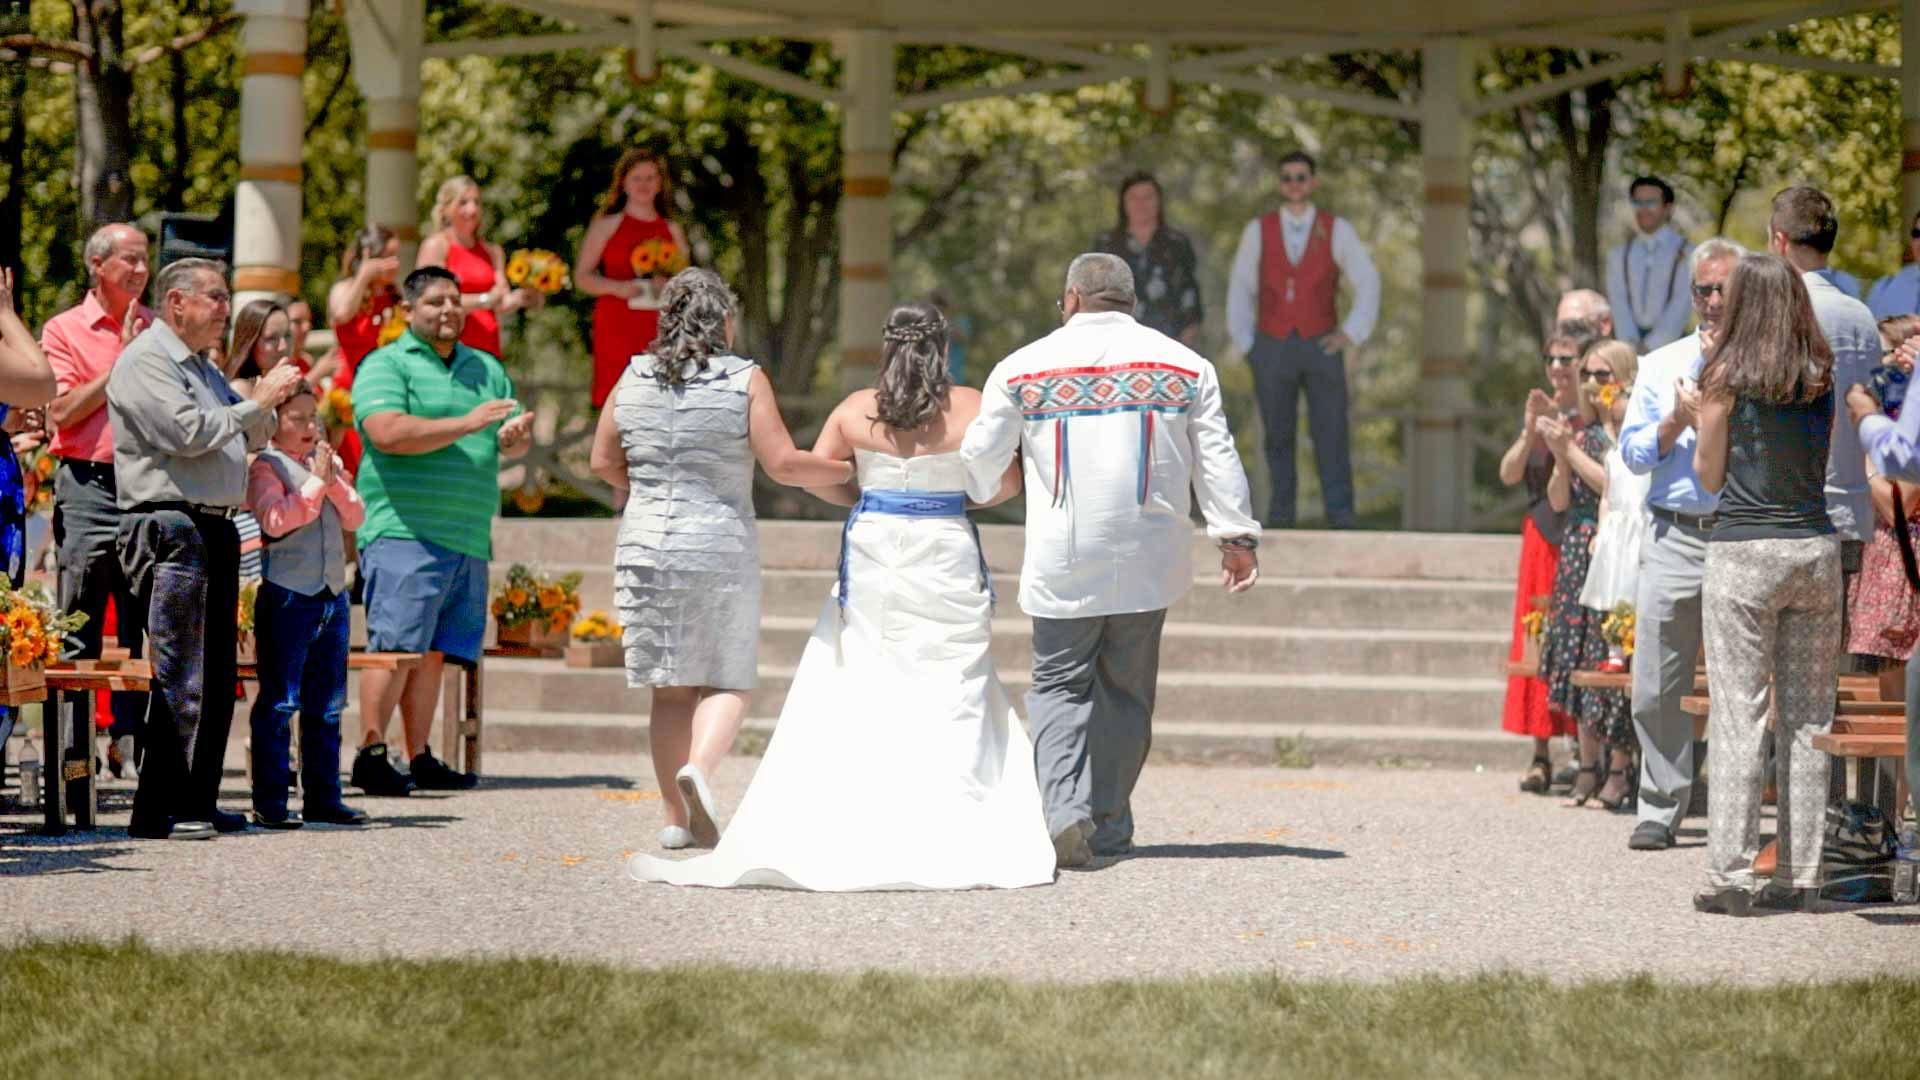 Native American Wedding.Native American Wedding Archives Durango Weddings Magazine